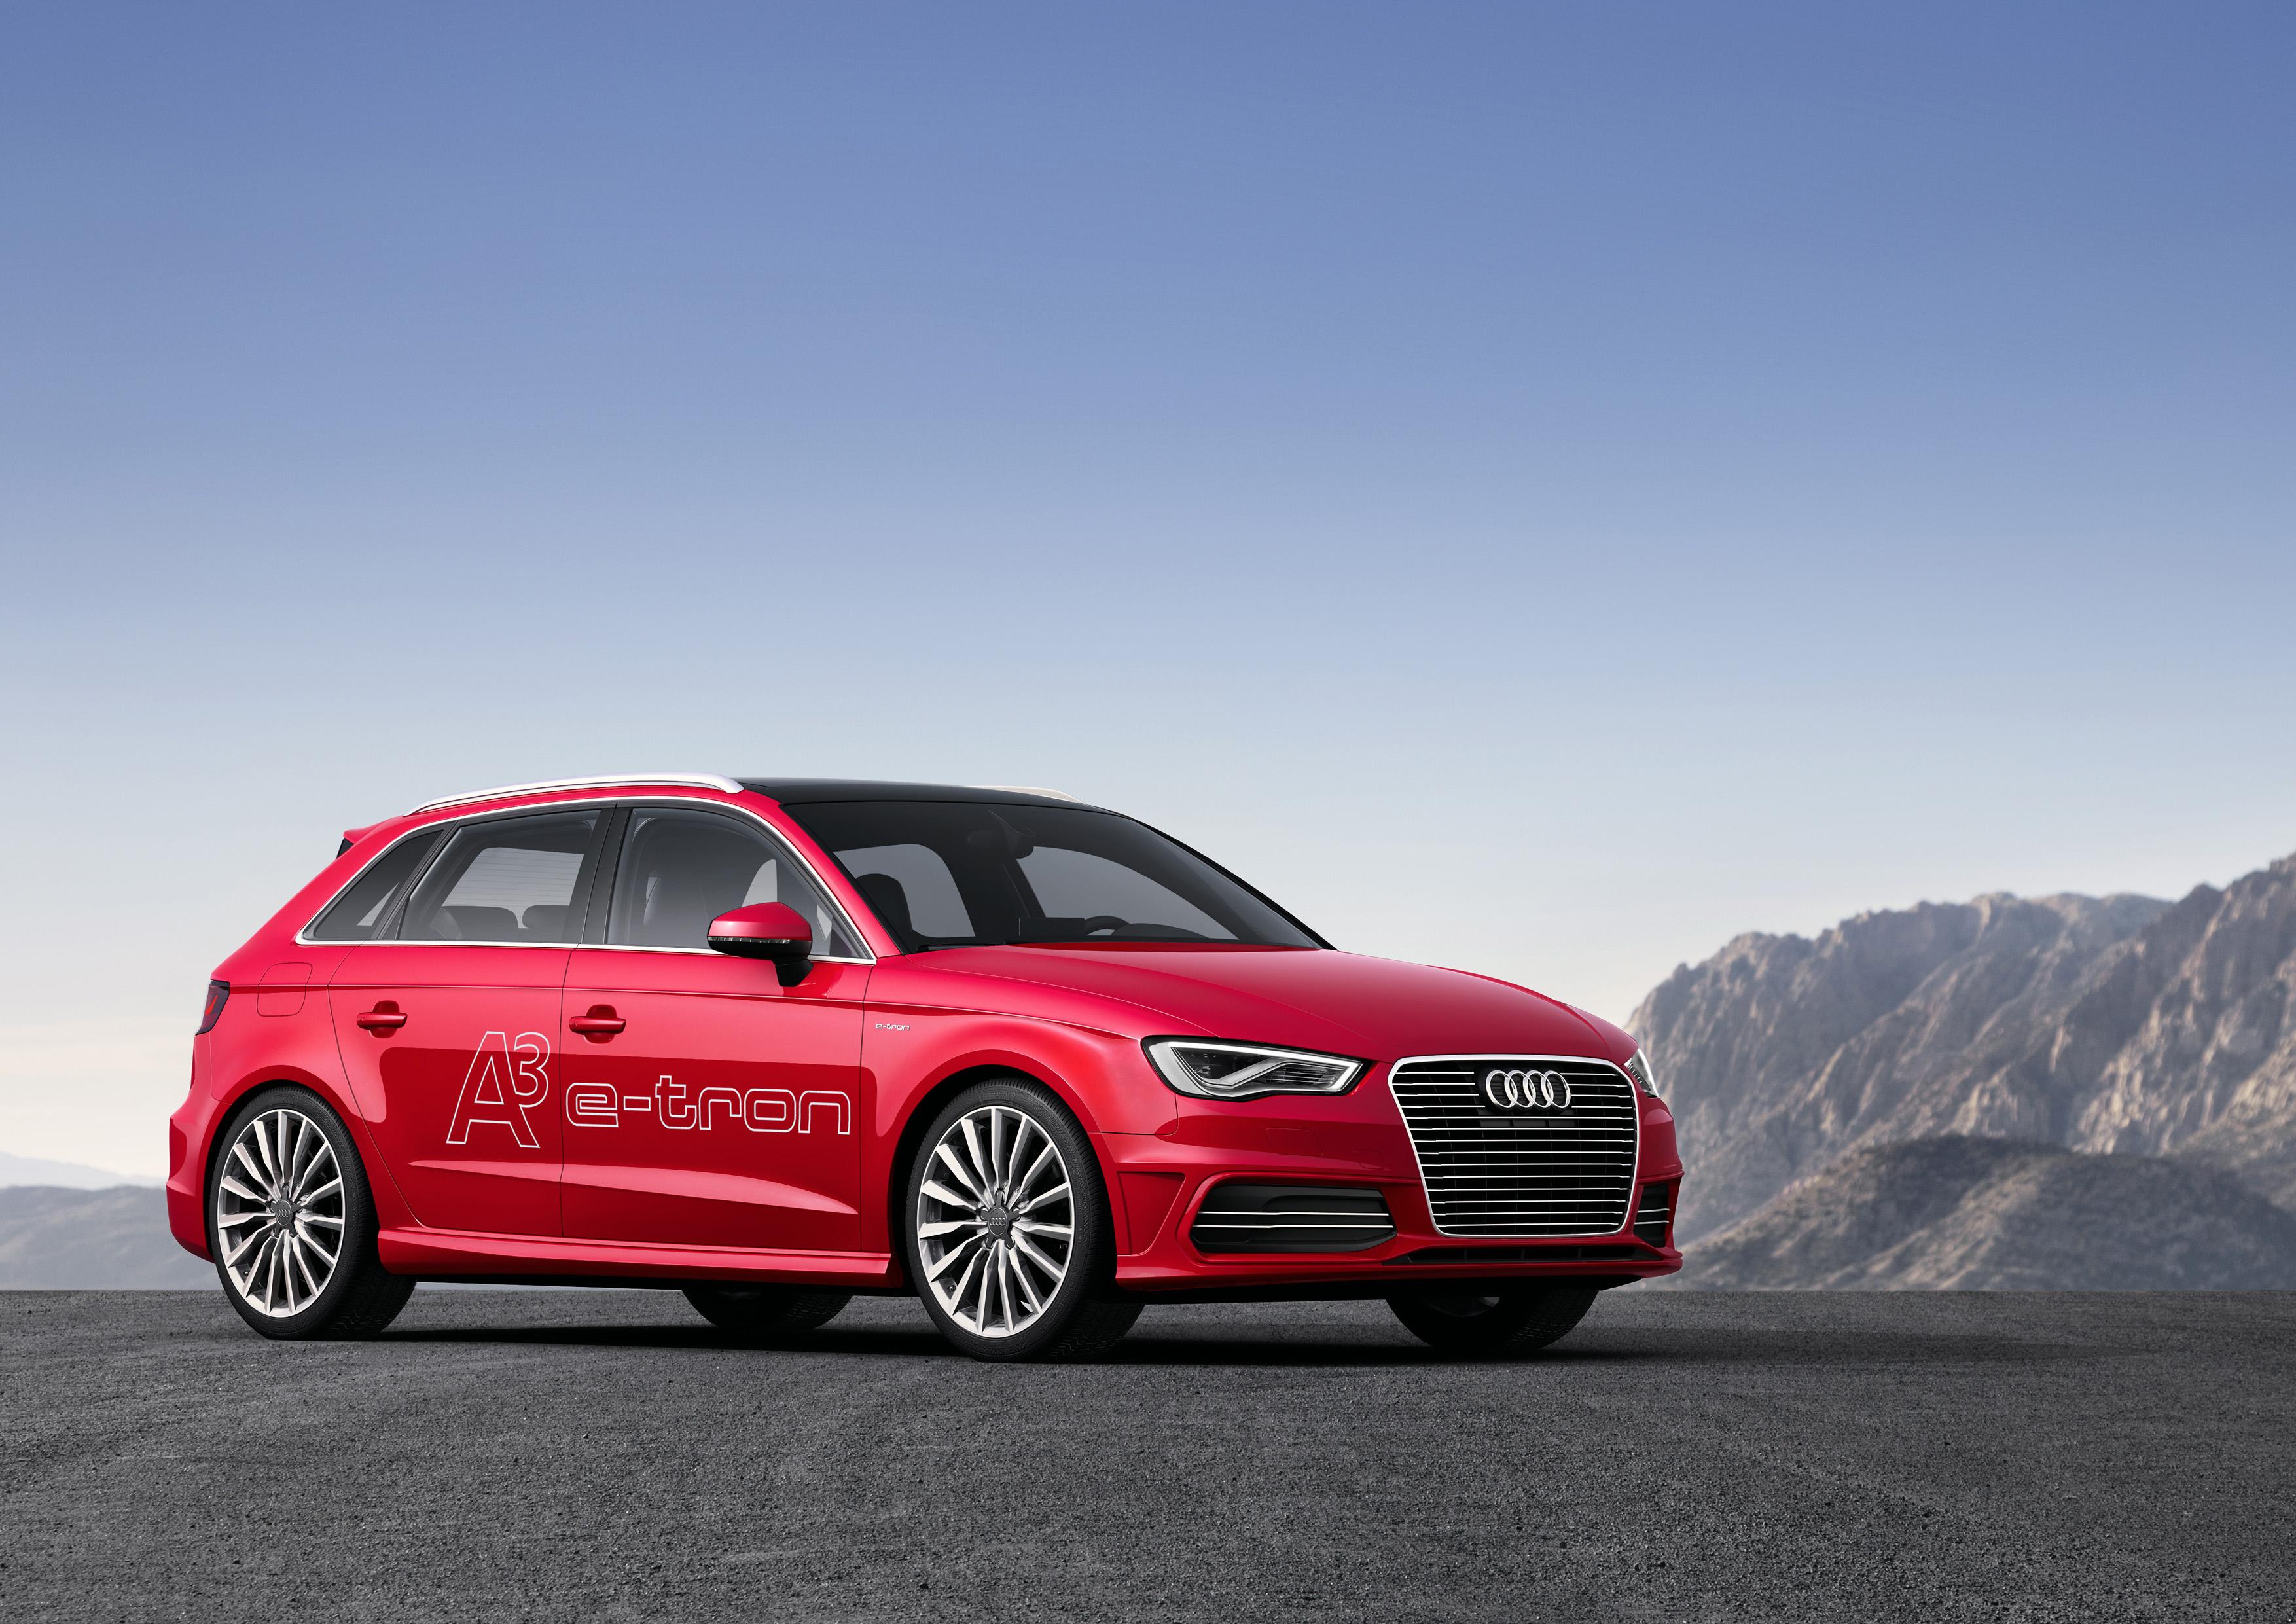 http://prensa.audi.es/wp-content/uploads/2013/02/Audi-A3-e-tron.jpg